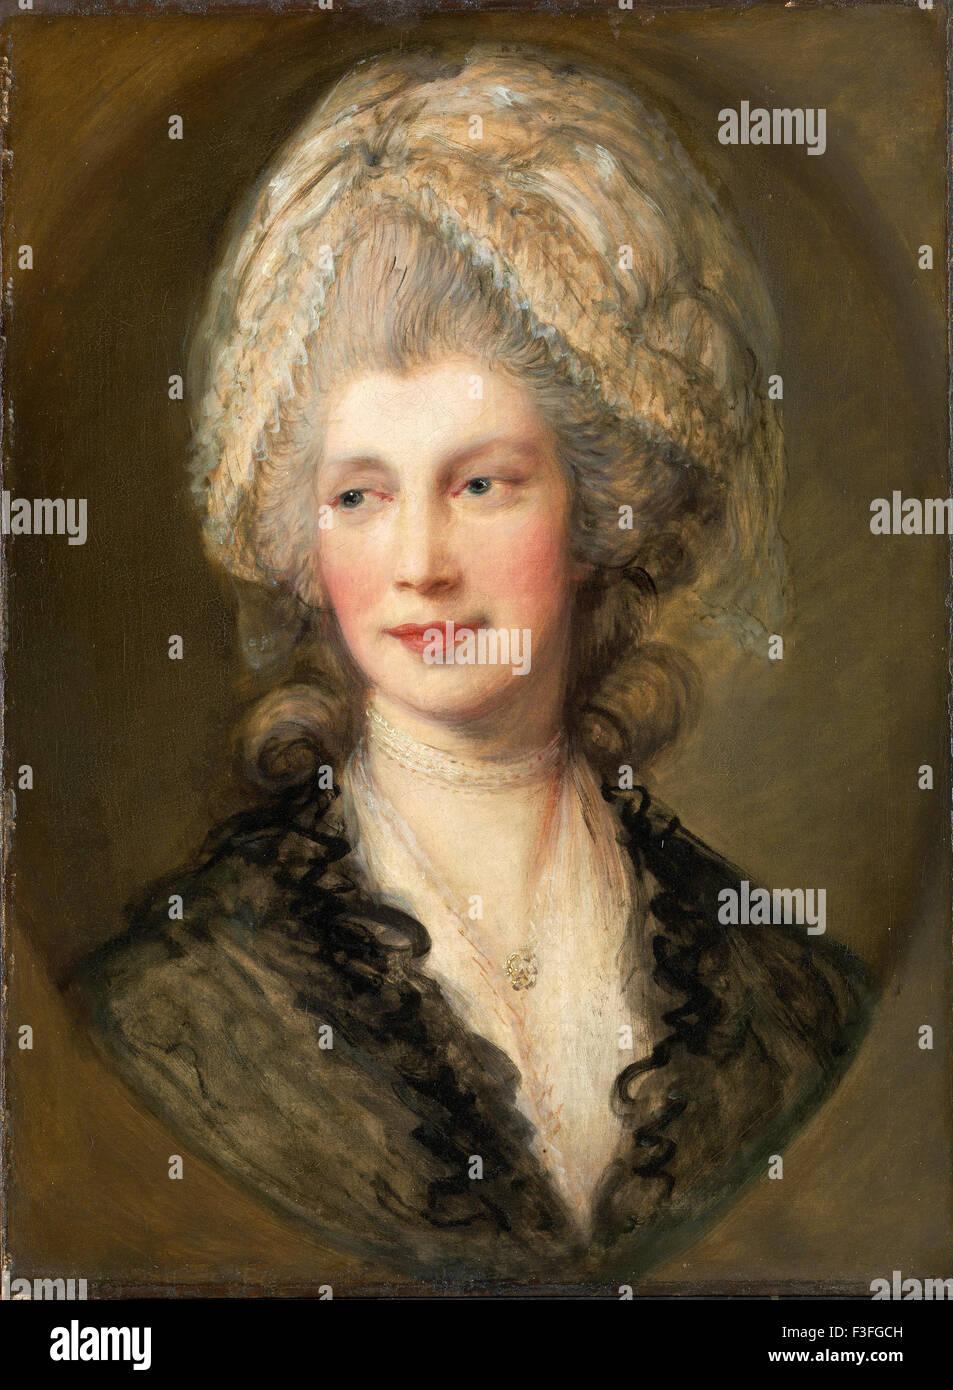 Thomas Gainsboroug - Queen Charlotte - Stock Image